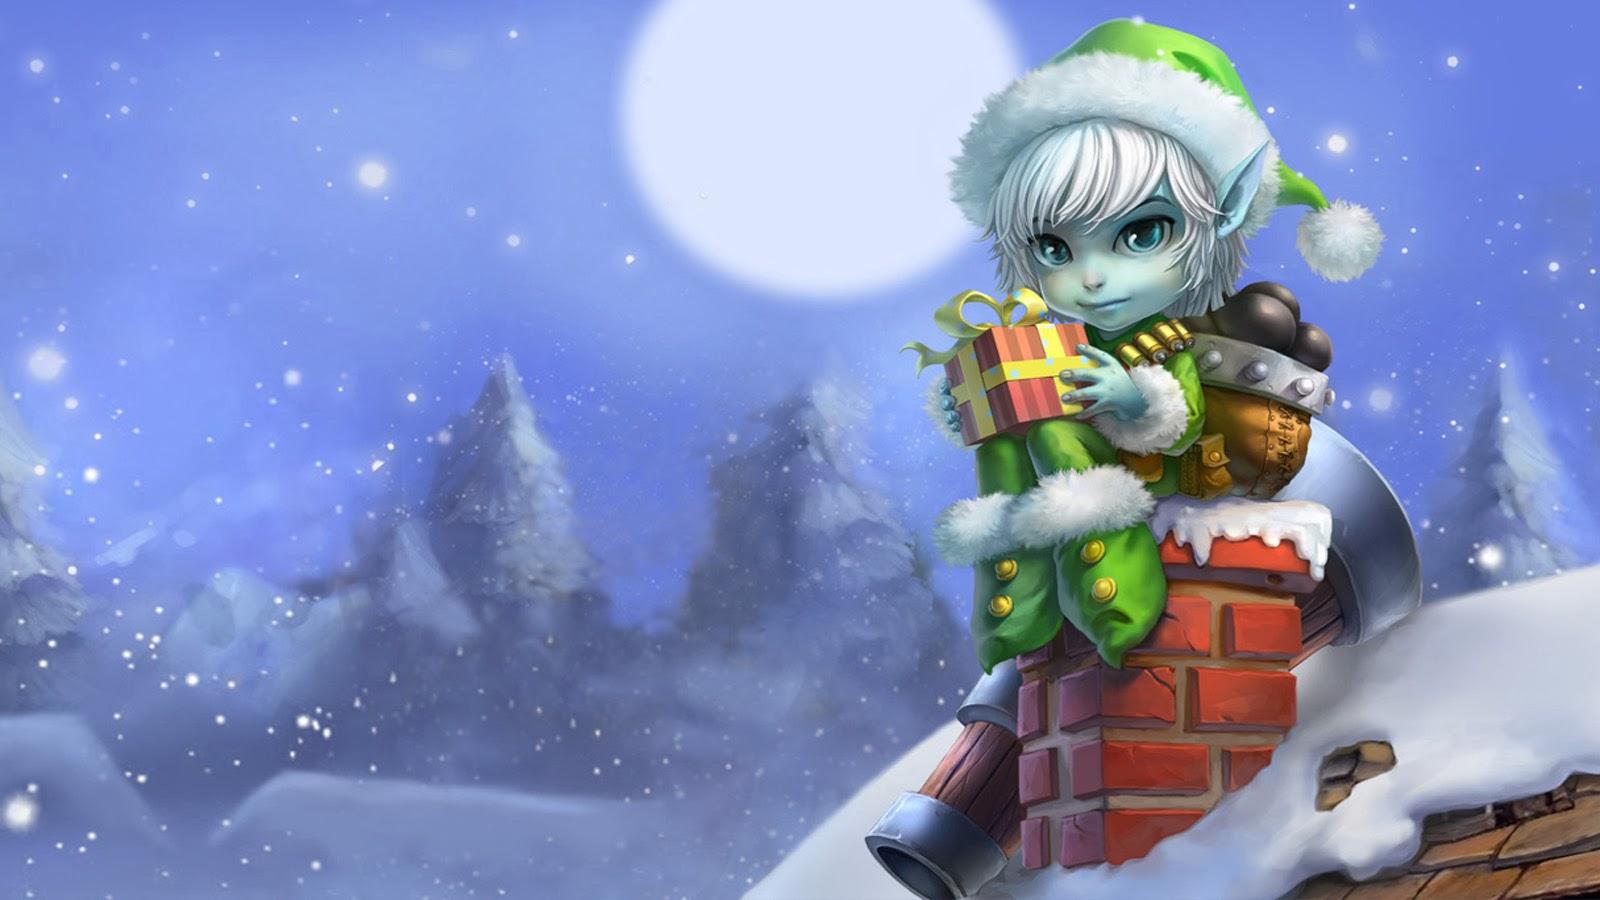 christmas elf wallpaper - photo #15